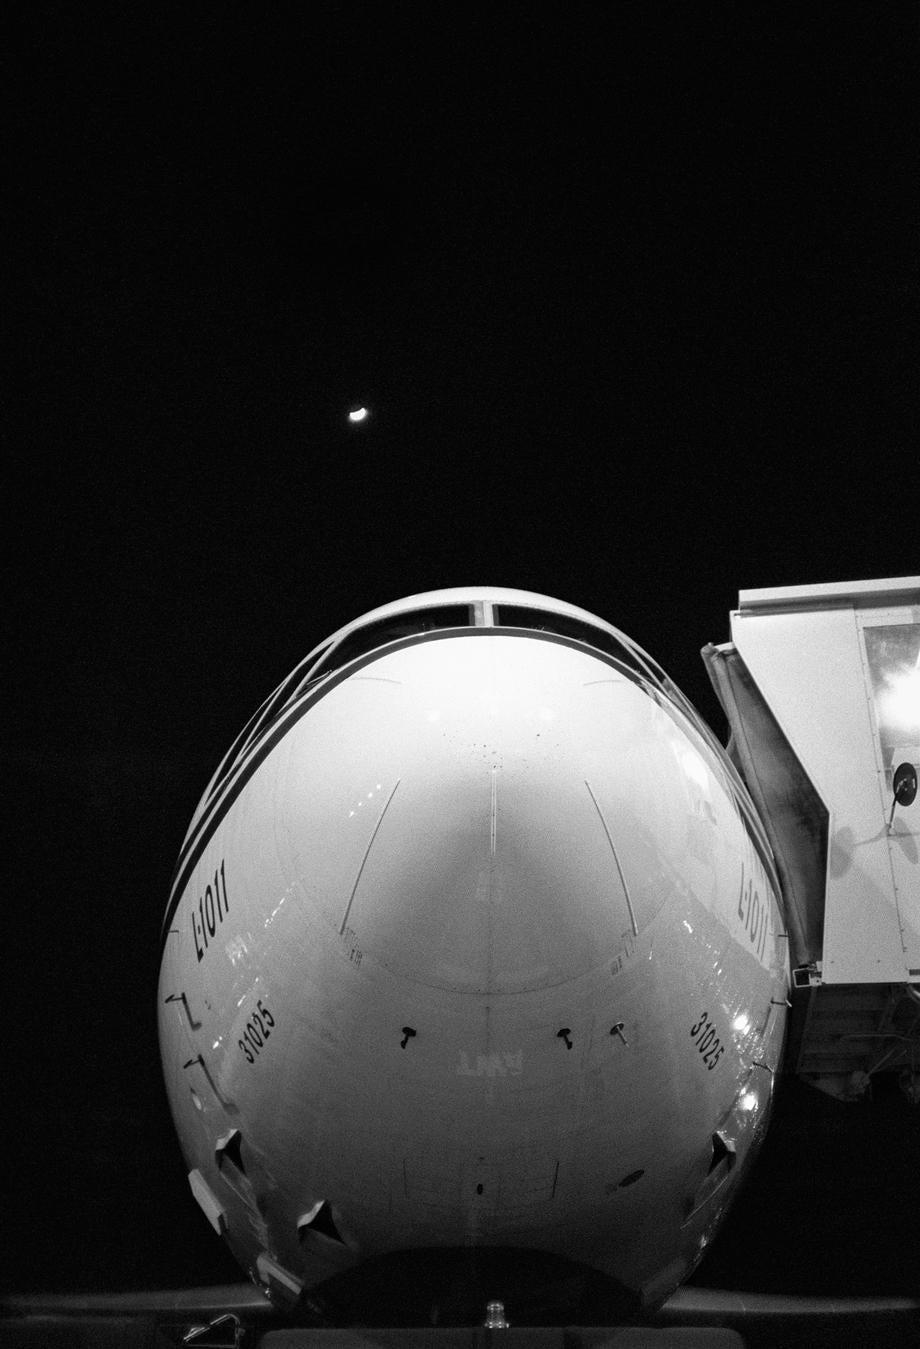 Moonrise Over Lockheed - JFK (The Flight Attendant Years), 1982, printed 2013archival pigment print